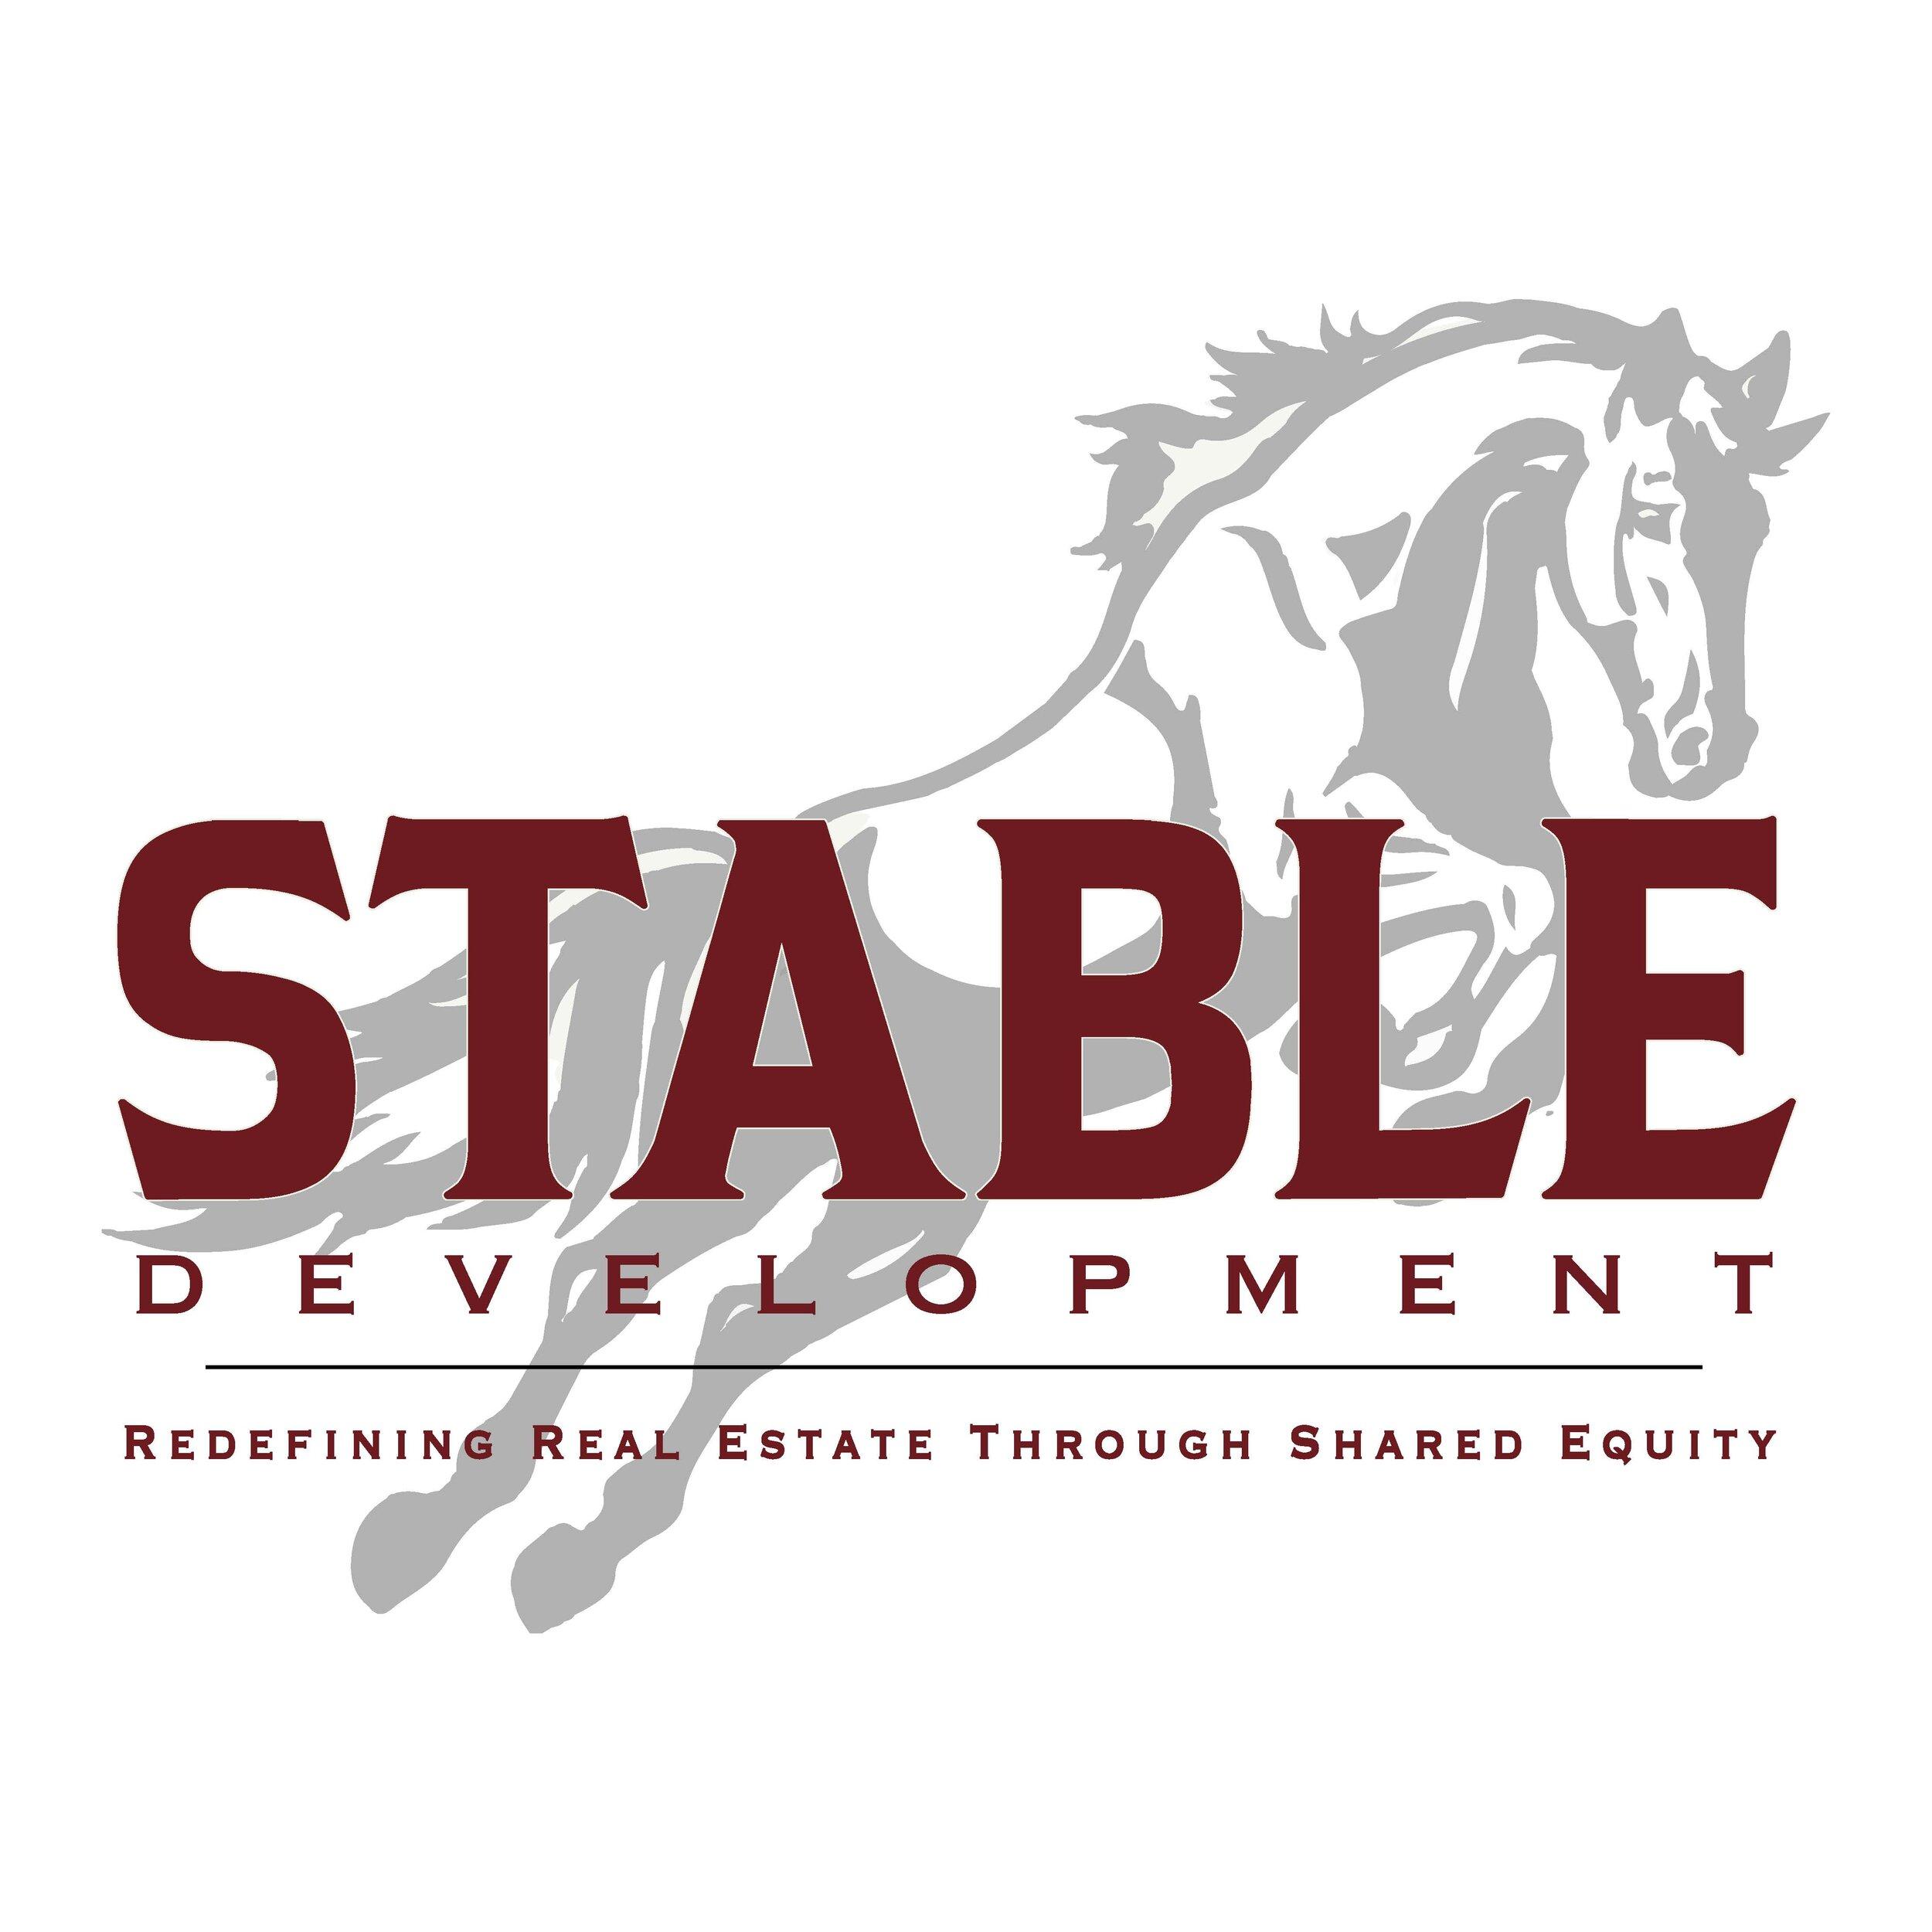 stable 16 no background.ai (pdf).jpg